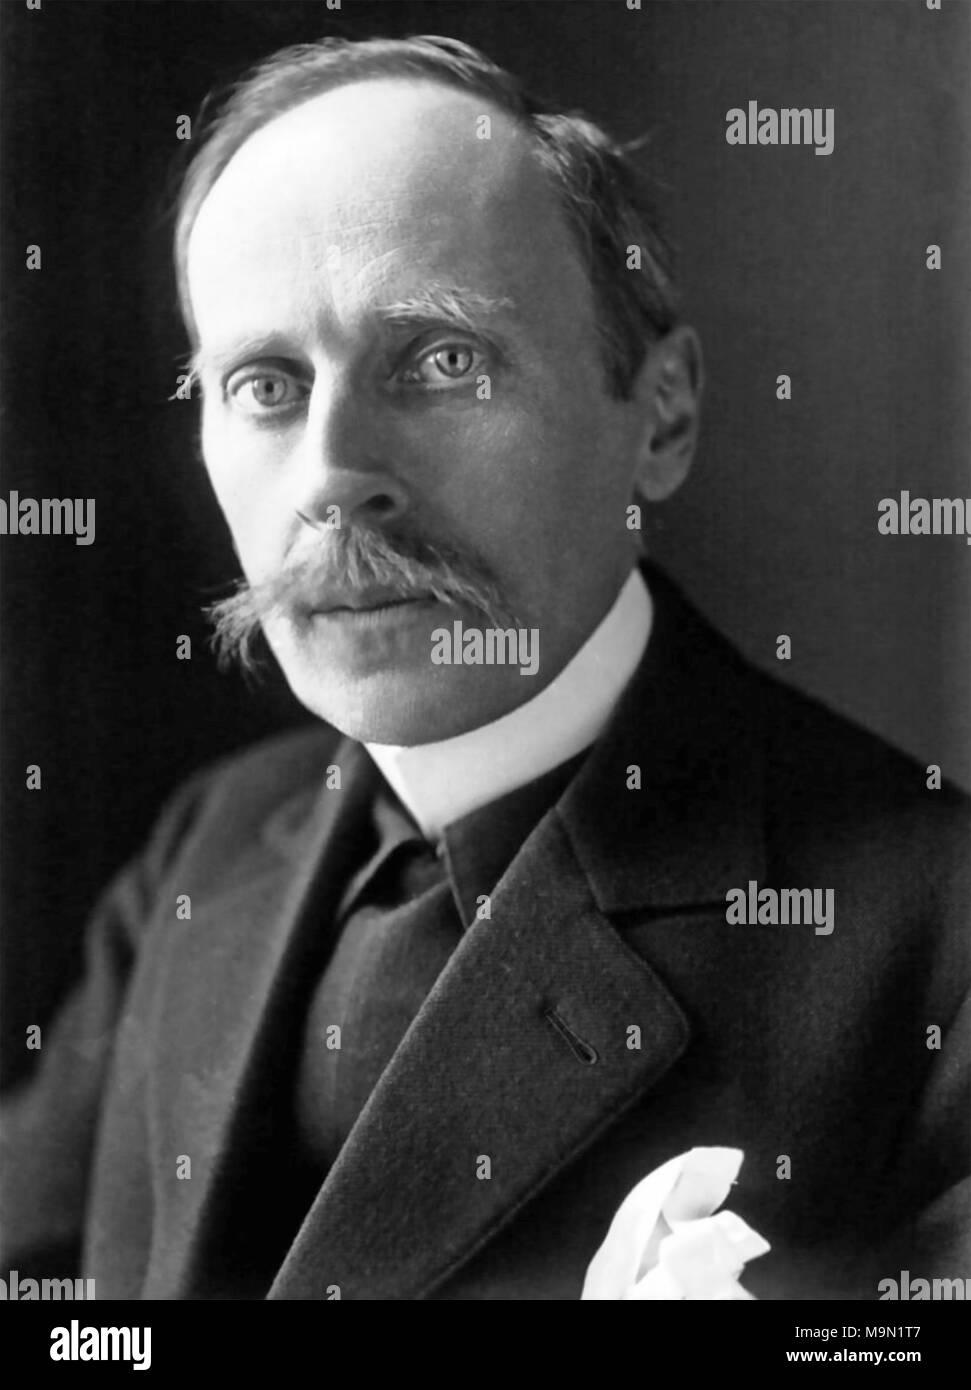 ROMAIN ROLLAND (1866-1944), novelista francés y místico acerca de 1915 Imagen De Stock